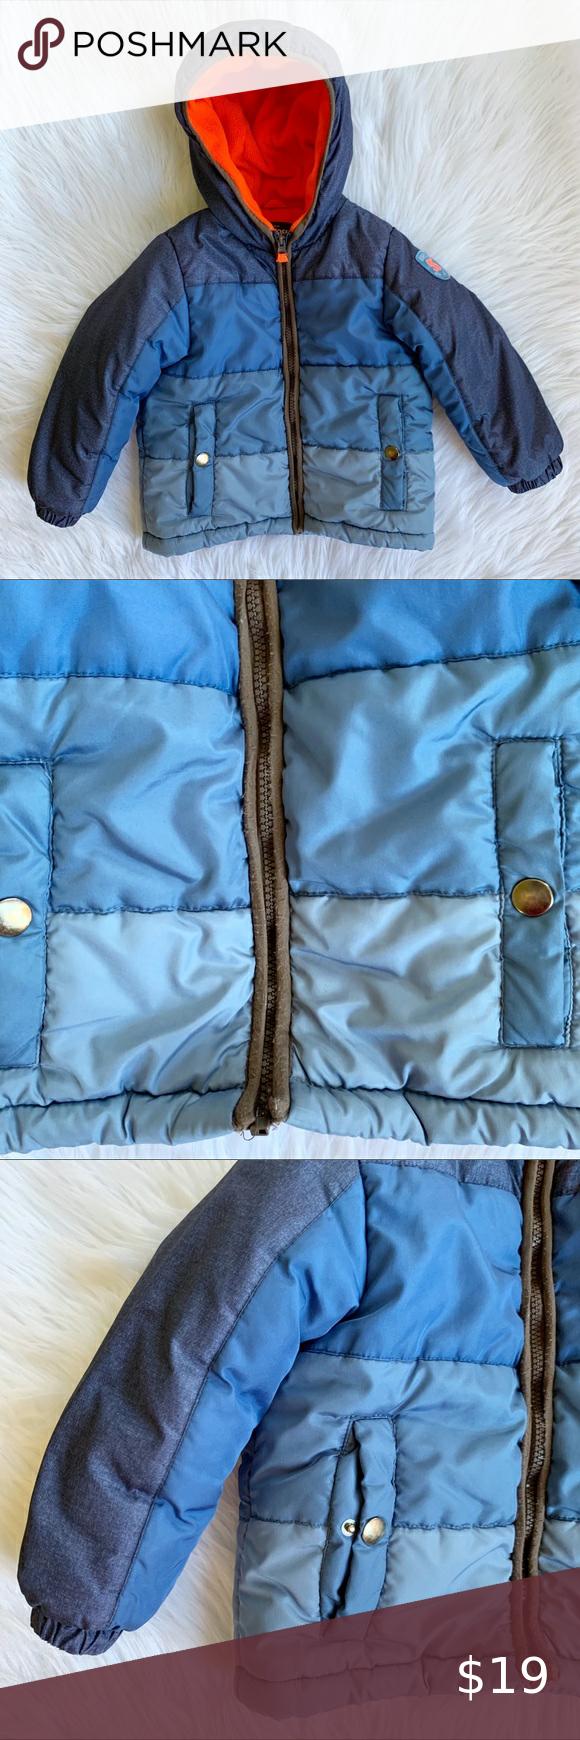 Oshkosh B Gosh Blue Boys Puffer Jacket Size 5t Boys Puffer Jacket Pink Puffer Coat Pink Camo Jacket [ 1740 x 580 Pixel ]